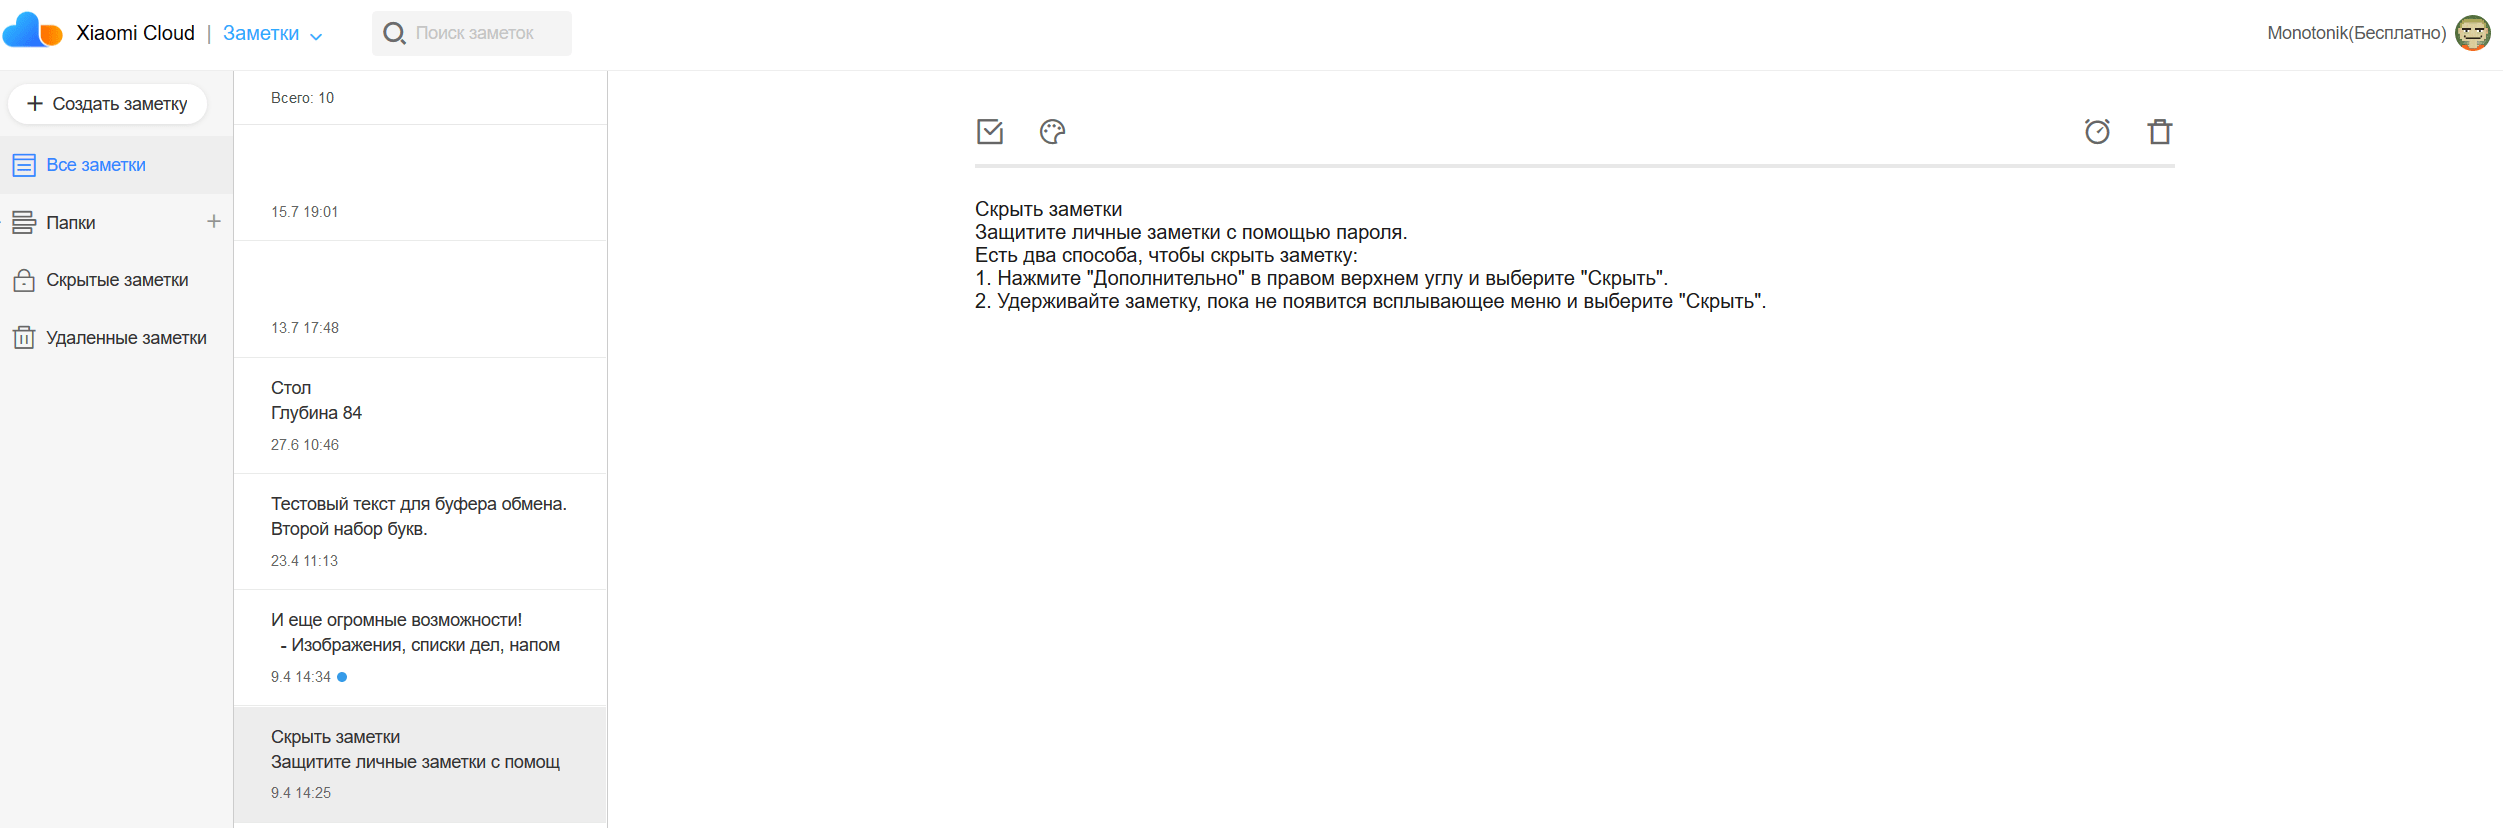 Операции с заметками на компьютере